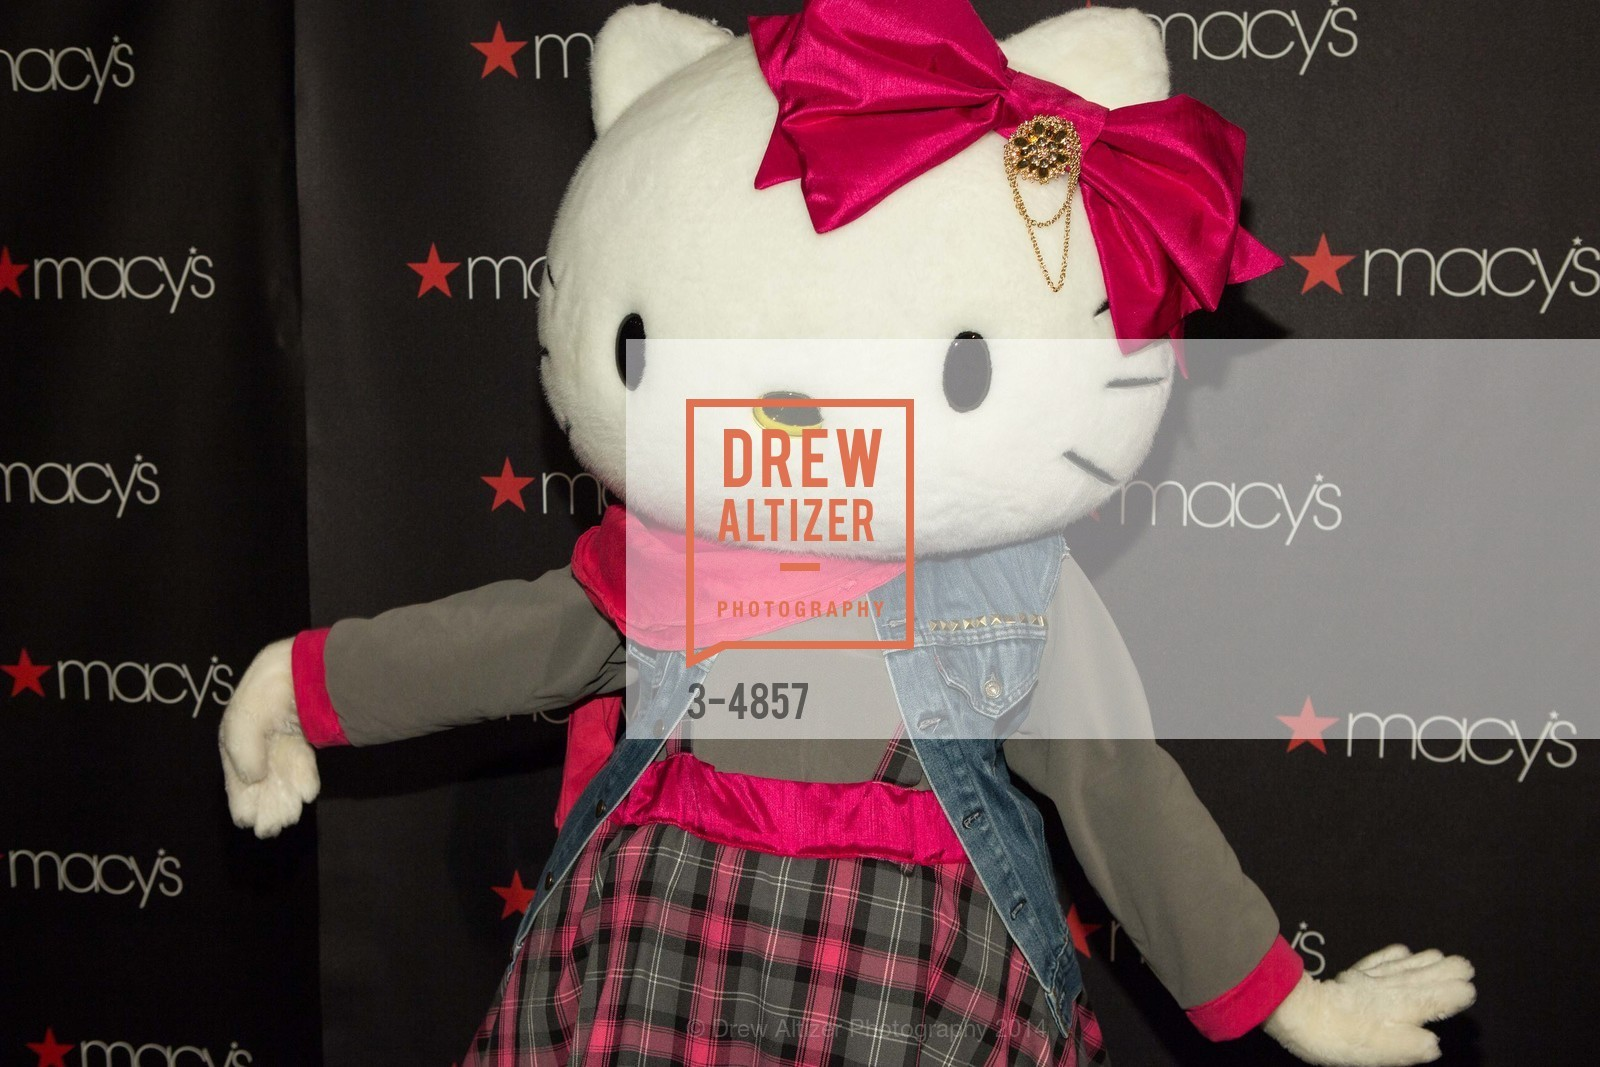 Hello Kitty, Photo #3-4857